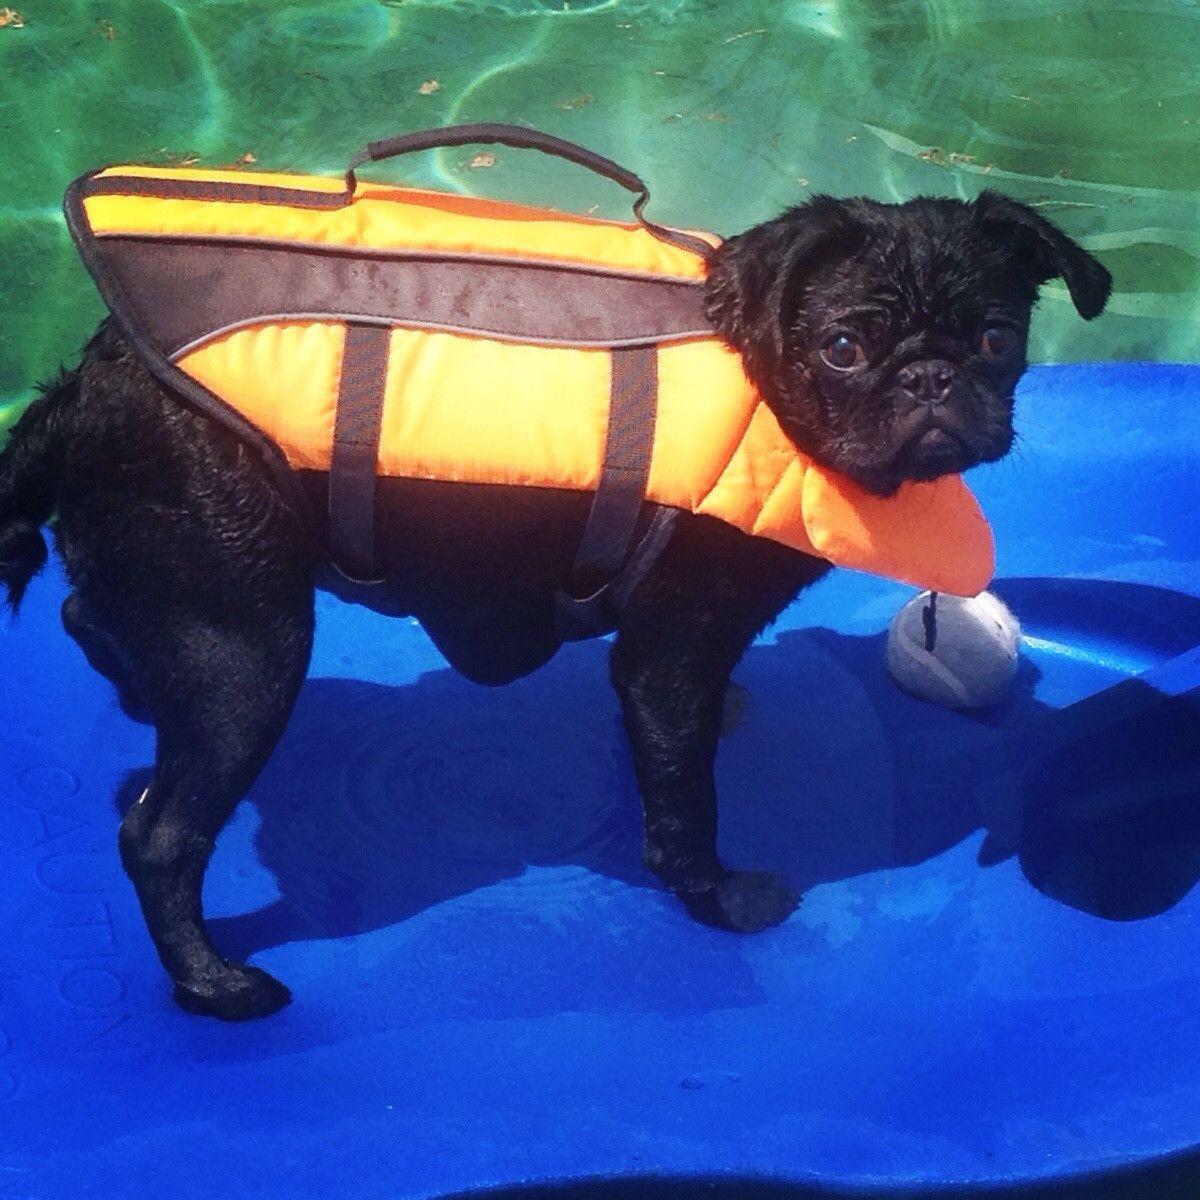 Surfing Pug DogsPugs Pinterest Dog - Brandy the award winning surfing pug